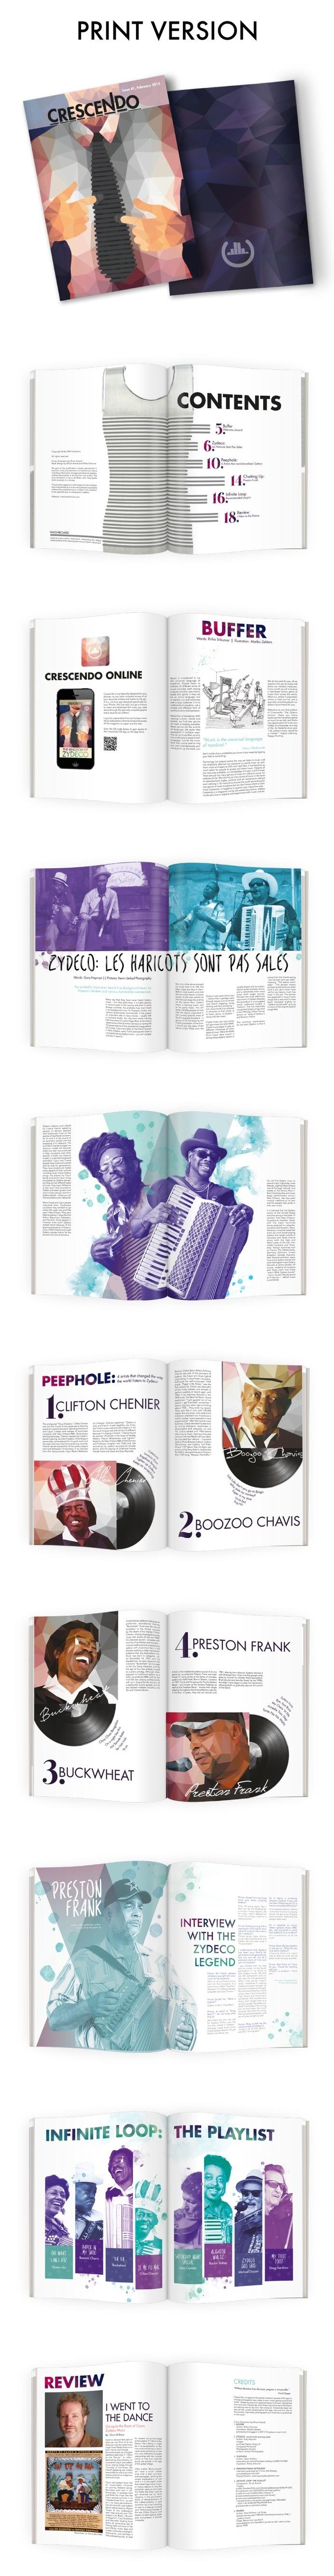 Print Layouts for Crescendo Magazine- The Zydeco Issue #zydeco #design #music #layout #crescendo #editorial #magazine